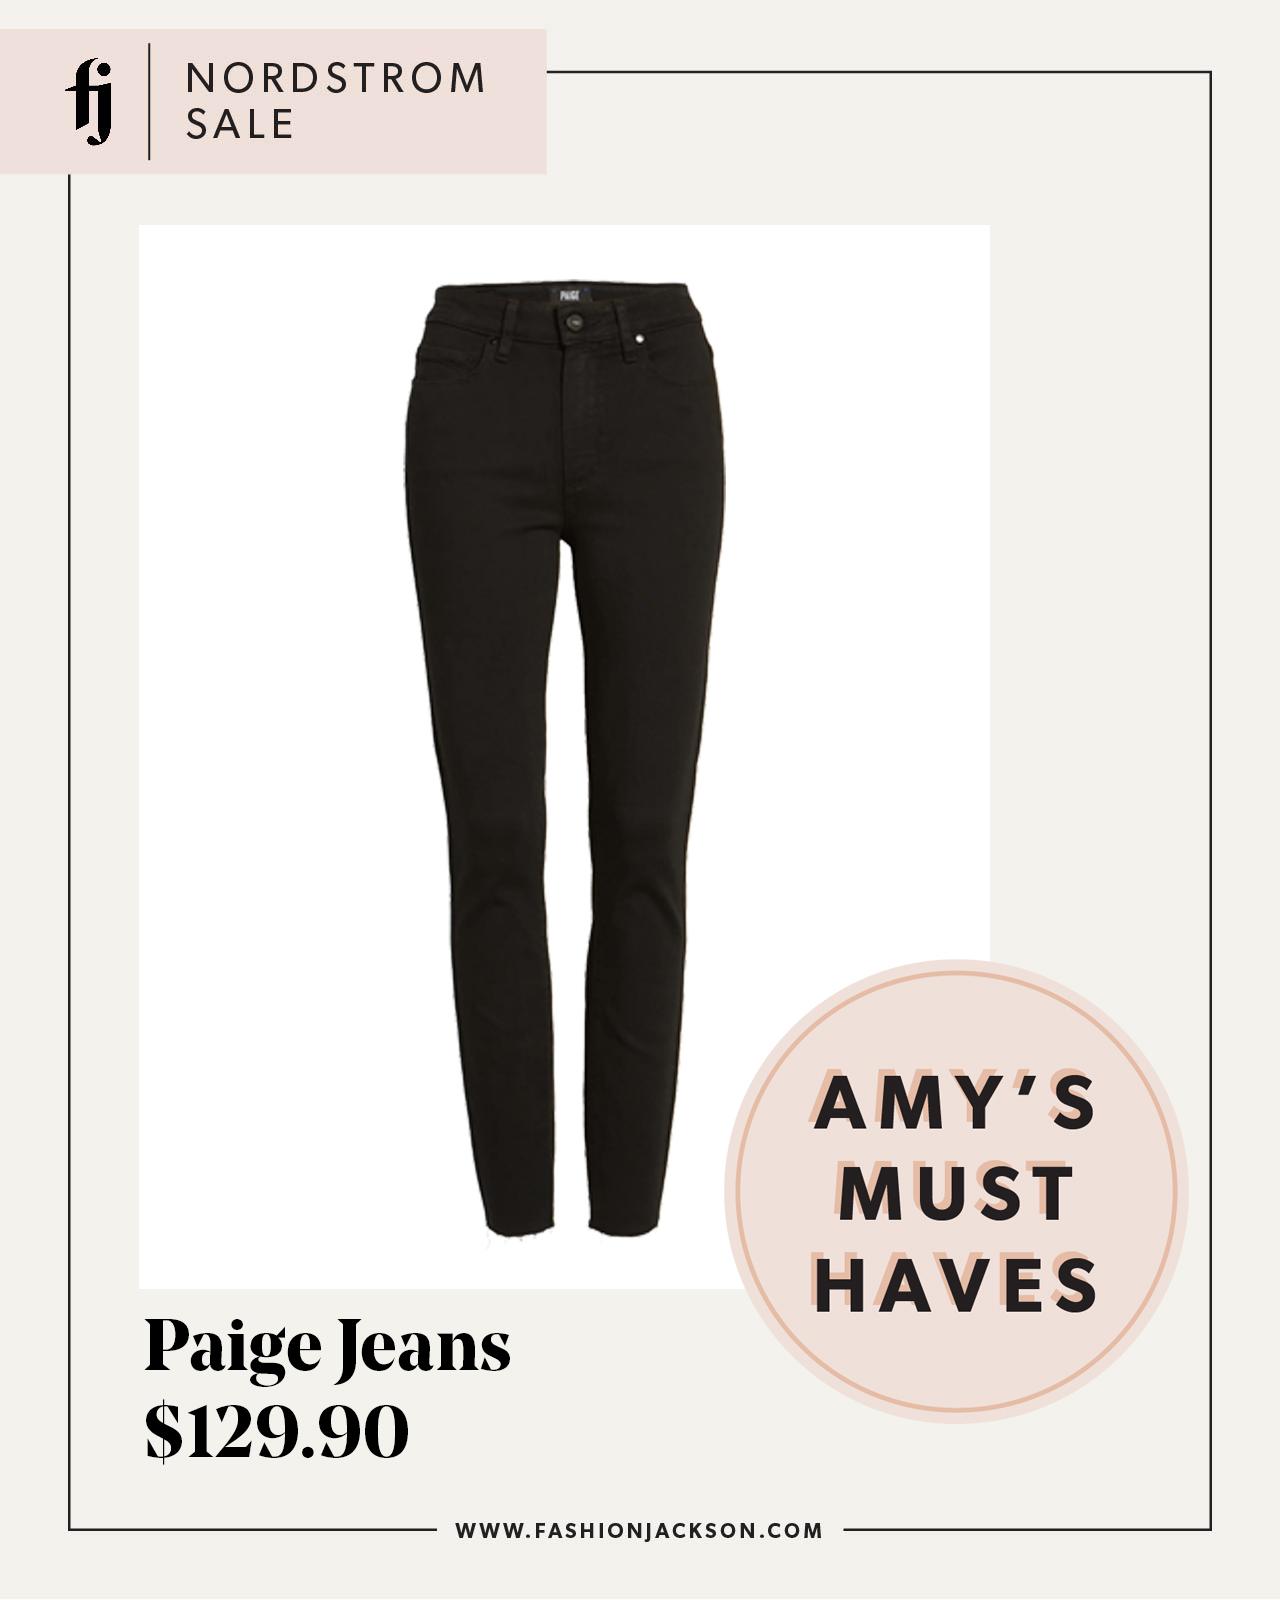 fashion jackson nordstrom anniversary sale paige jeans